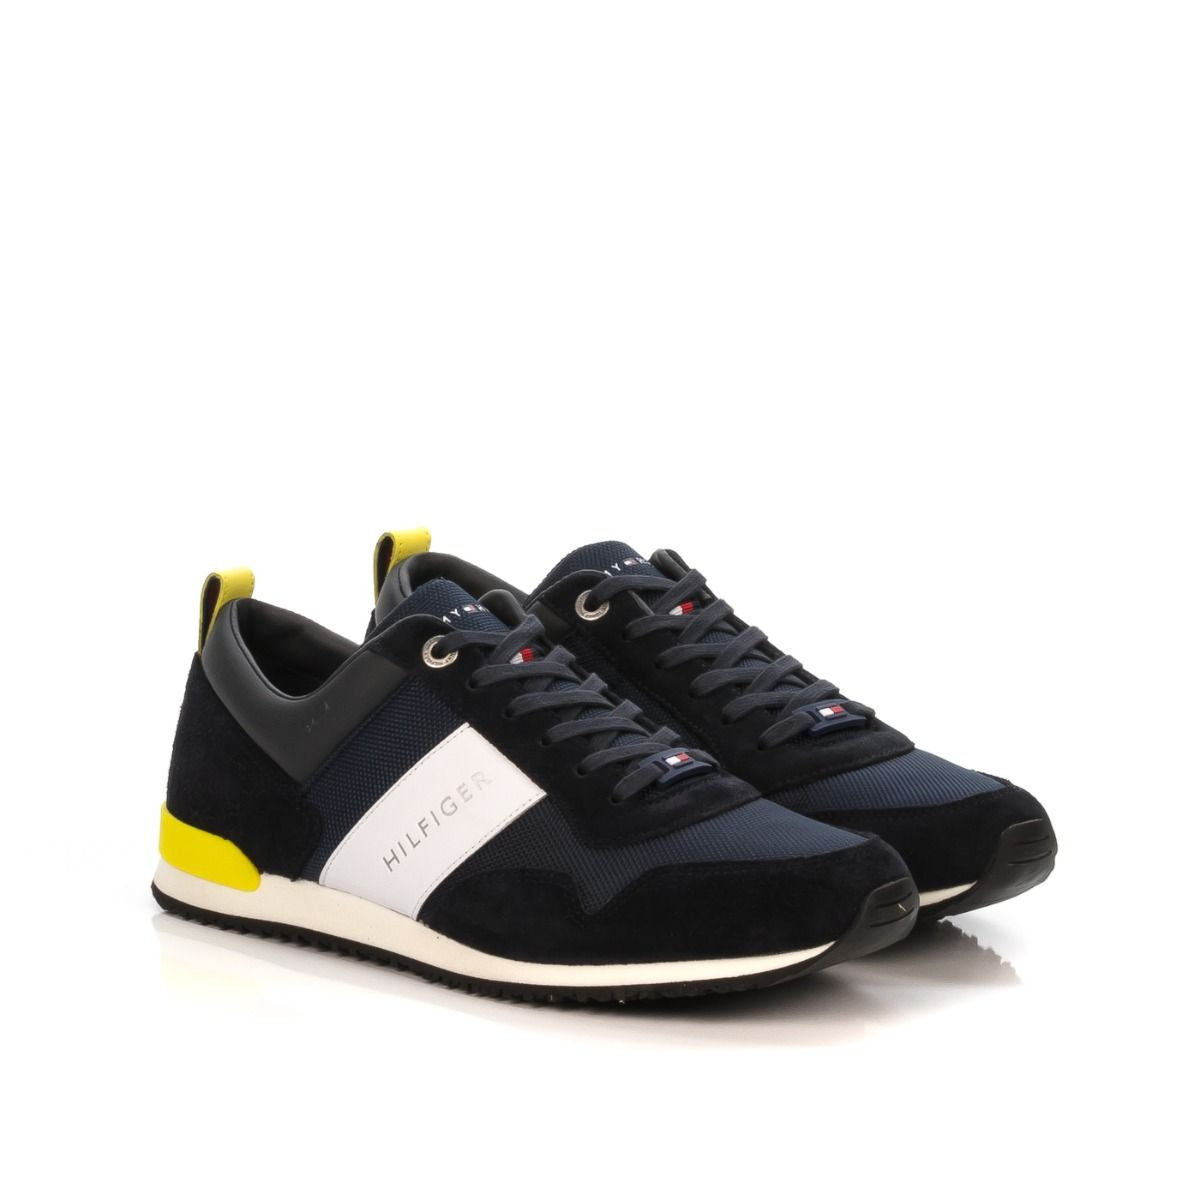 Sneakers uomo|TOMMY HILFIGER 2042 403 MAXWELL in camoscio e